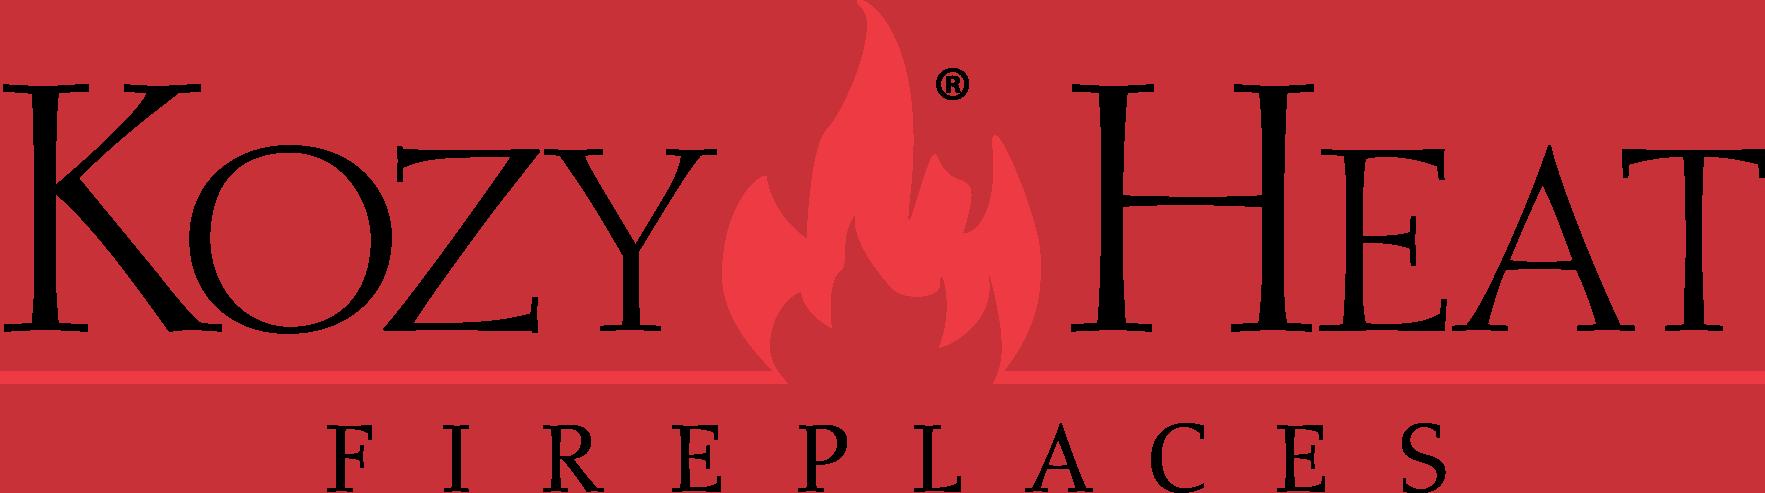 Kozy Heat logo.